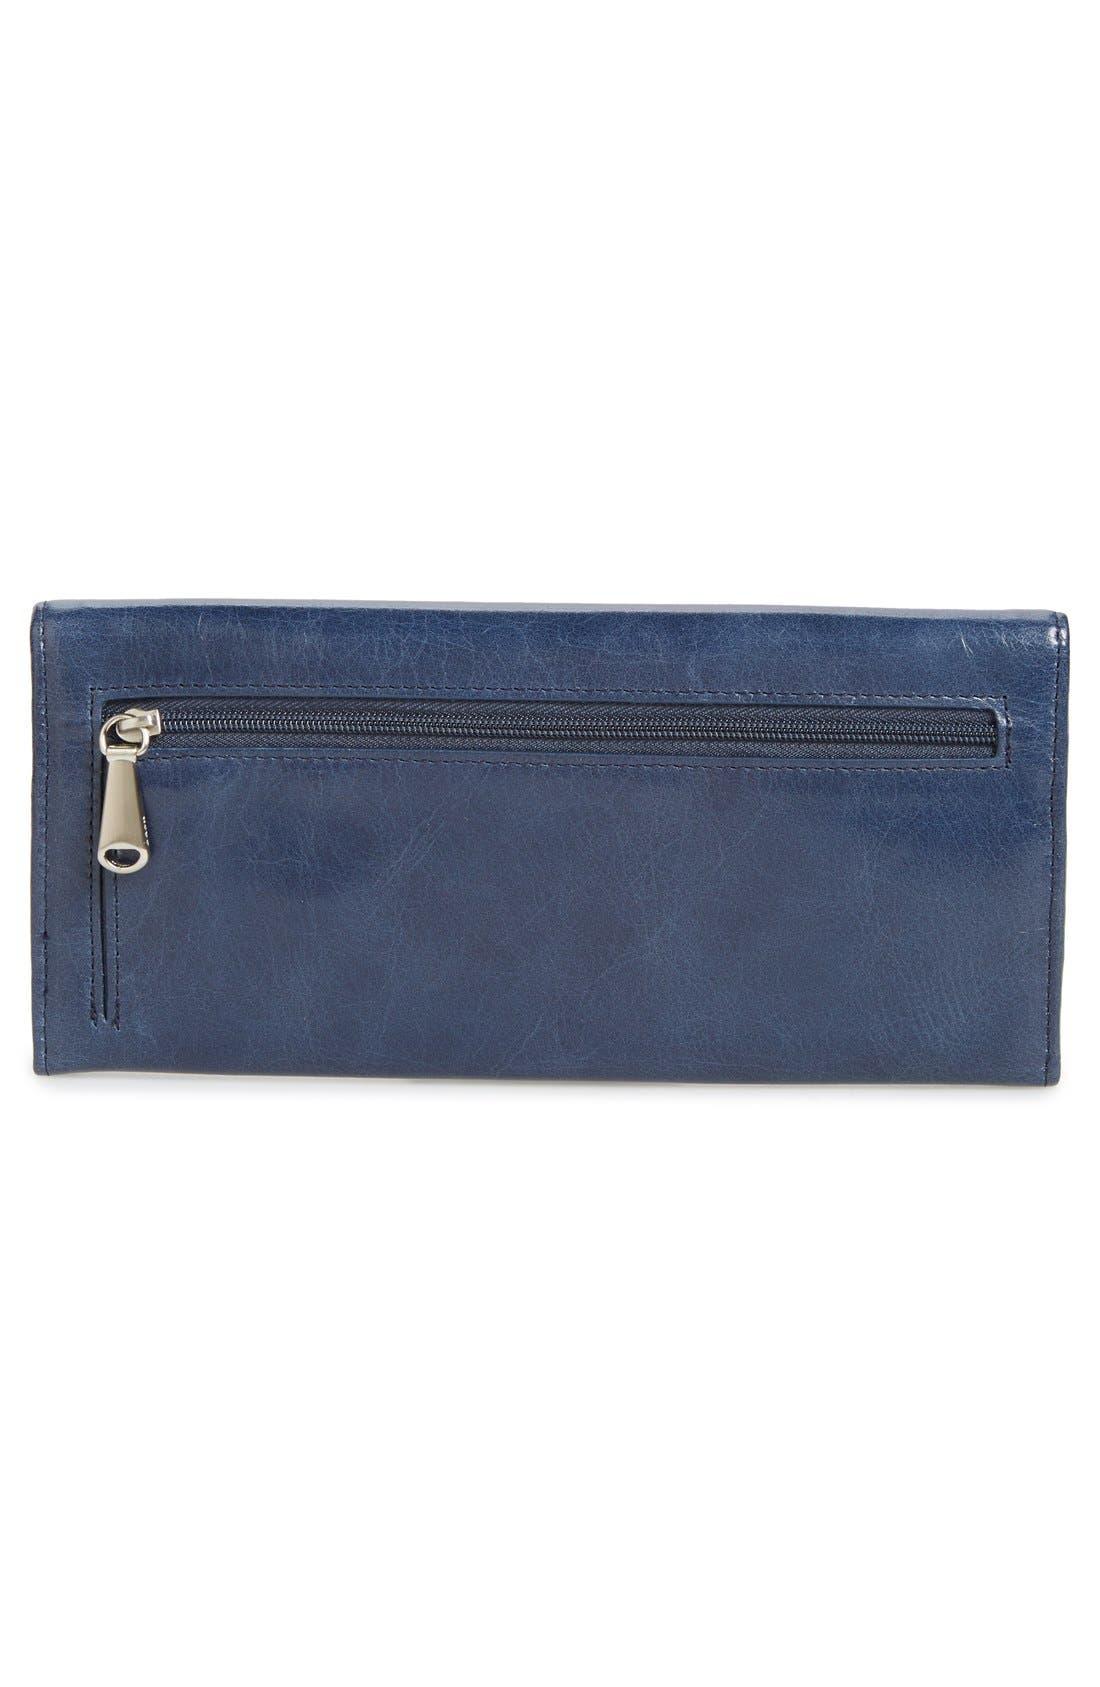 'Sadie' Leather Wallet,                             Alternate thumbnail 123, color,